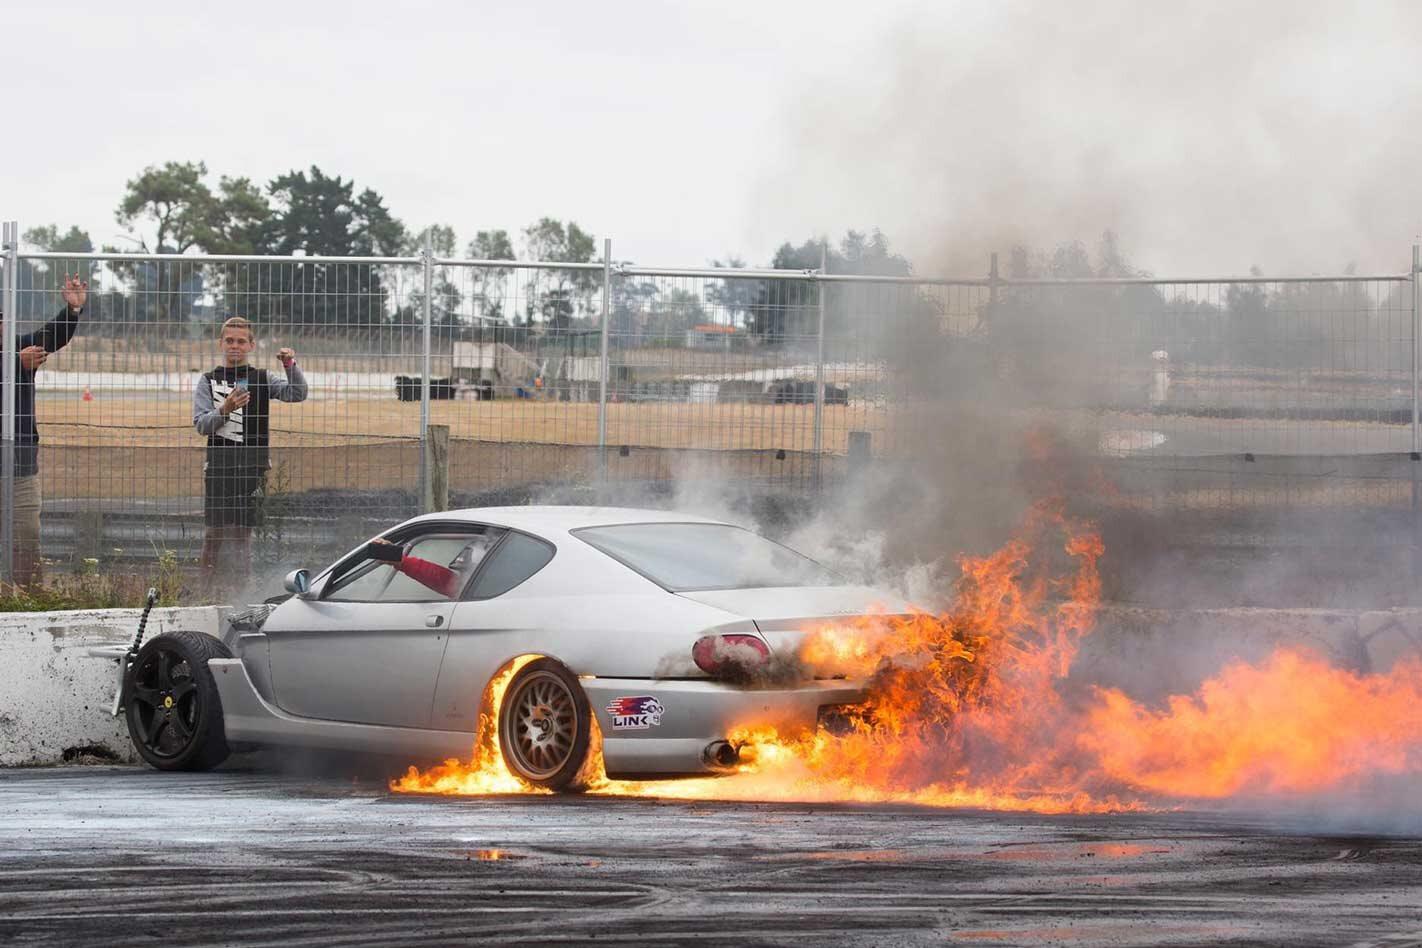 Rotary-swapped Ferrari 456 anger Maranello